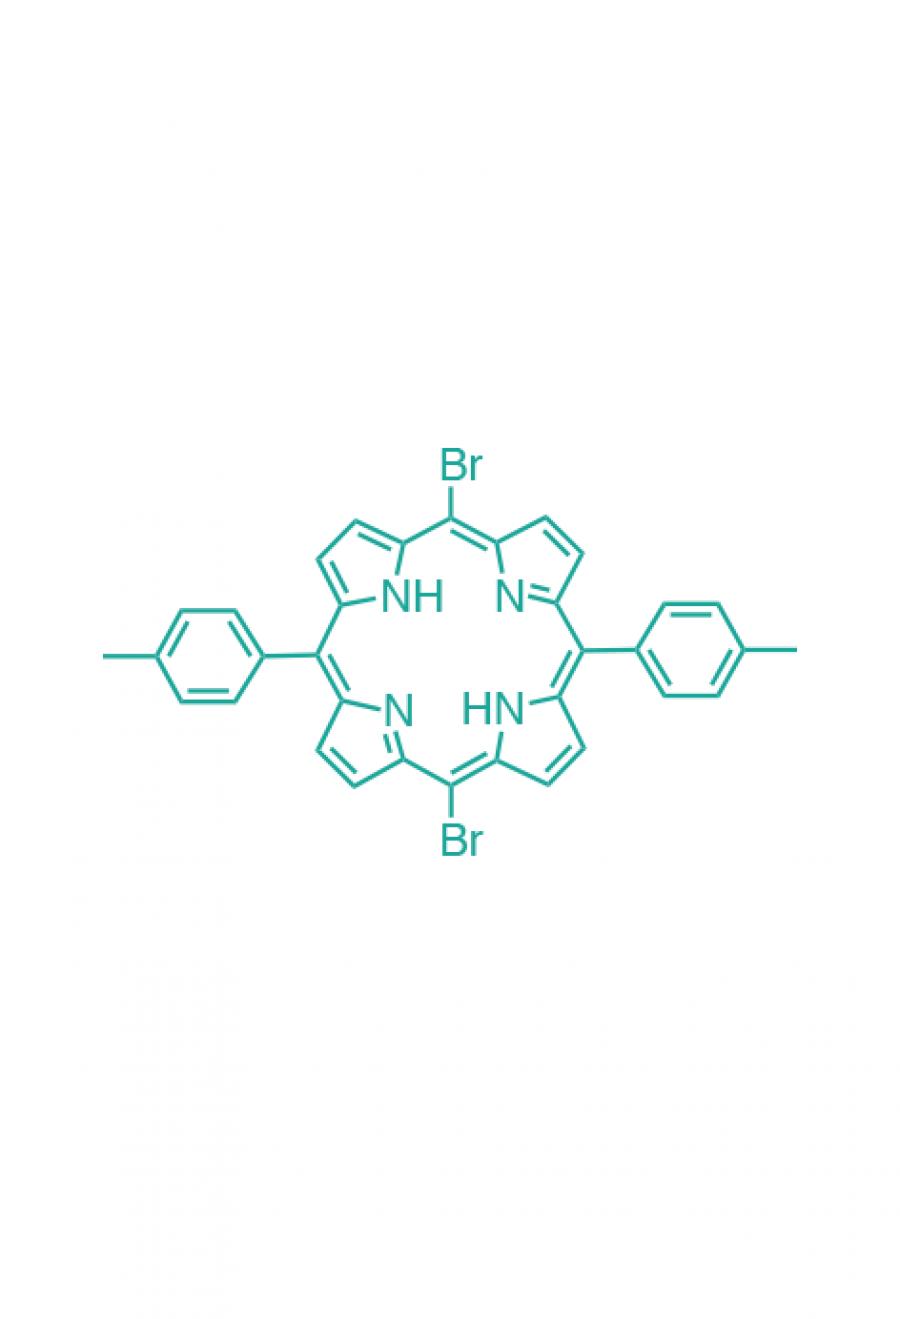 5,15-(di-p-tolyl)-10,20-(dibromo)porphyrin